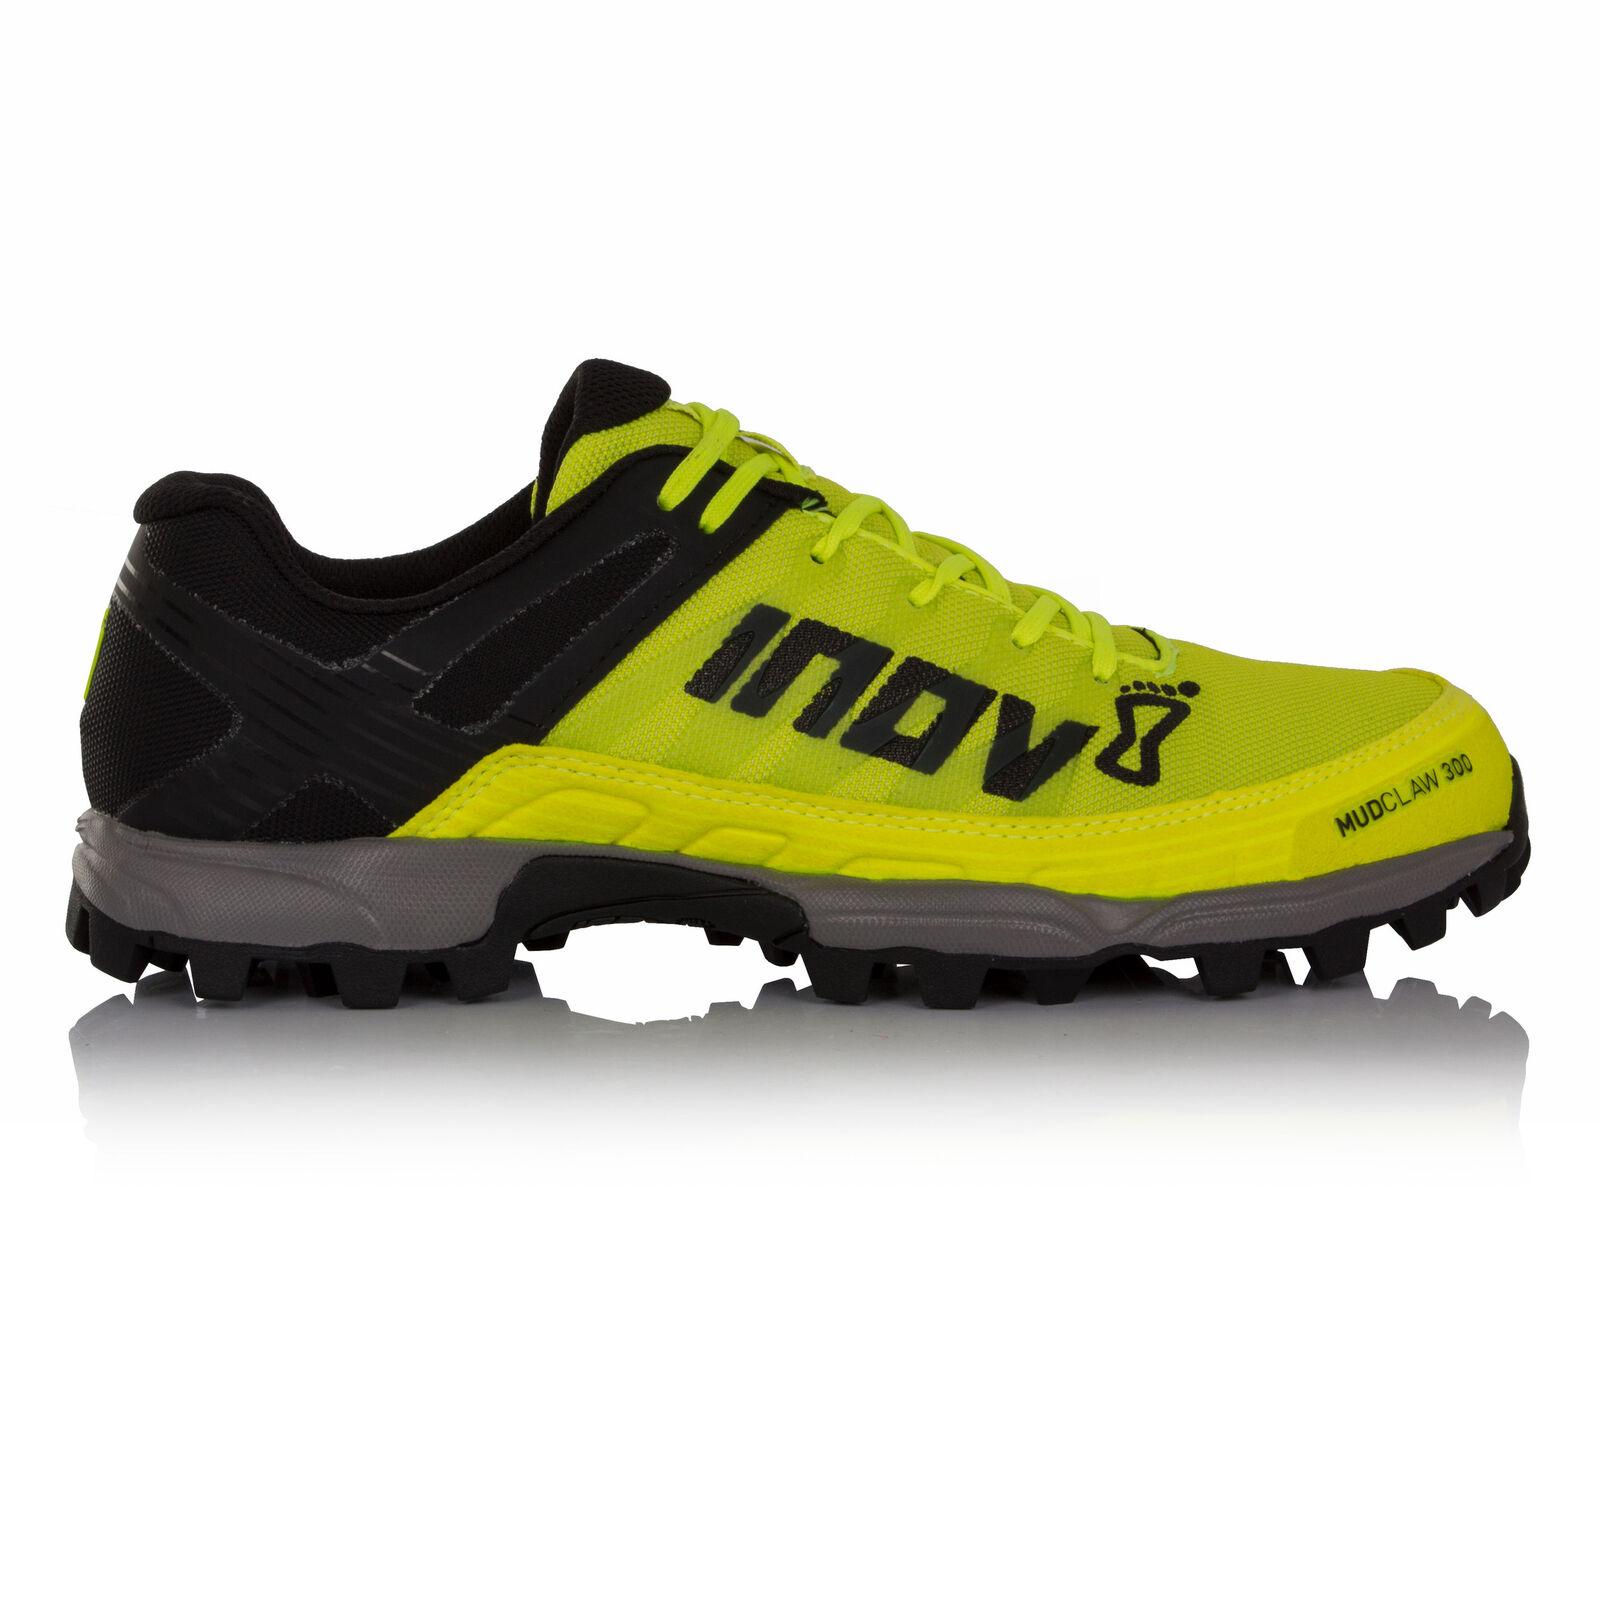 Inov8 Mudclaw 300 Unisex Amarillo Negro Sendero Correr Deporte  Zapato Zapatillas  con 60% de descuento